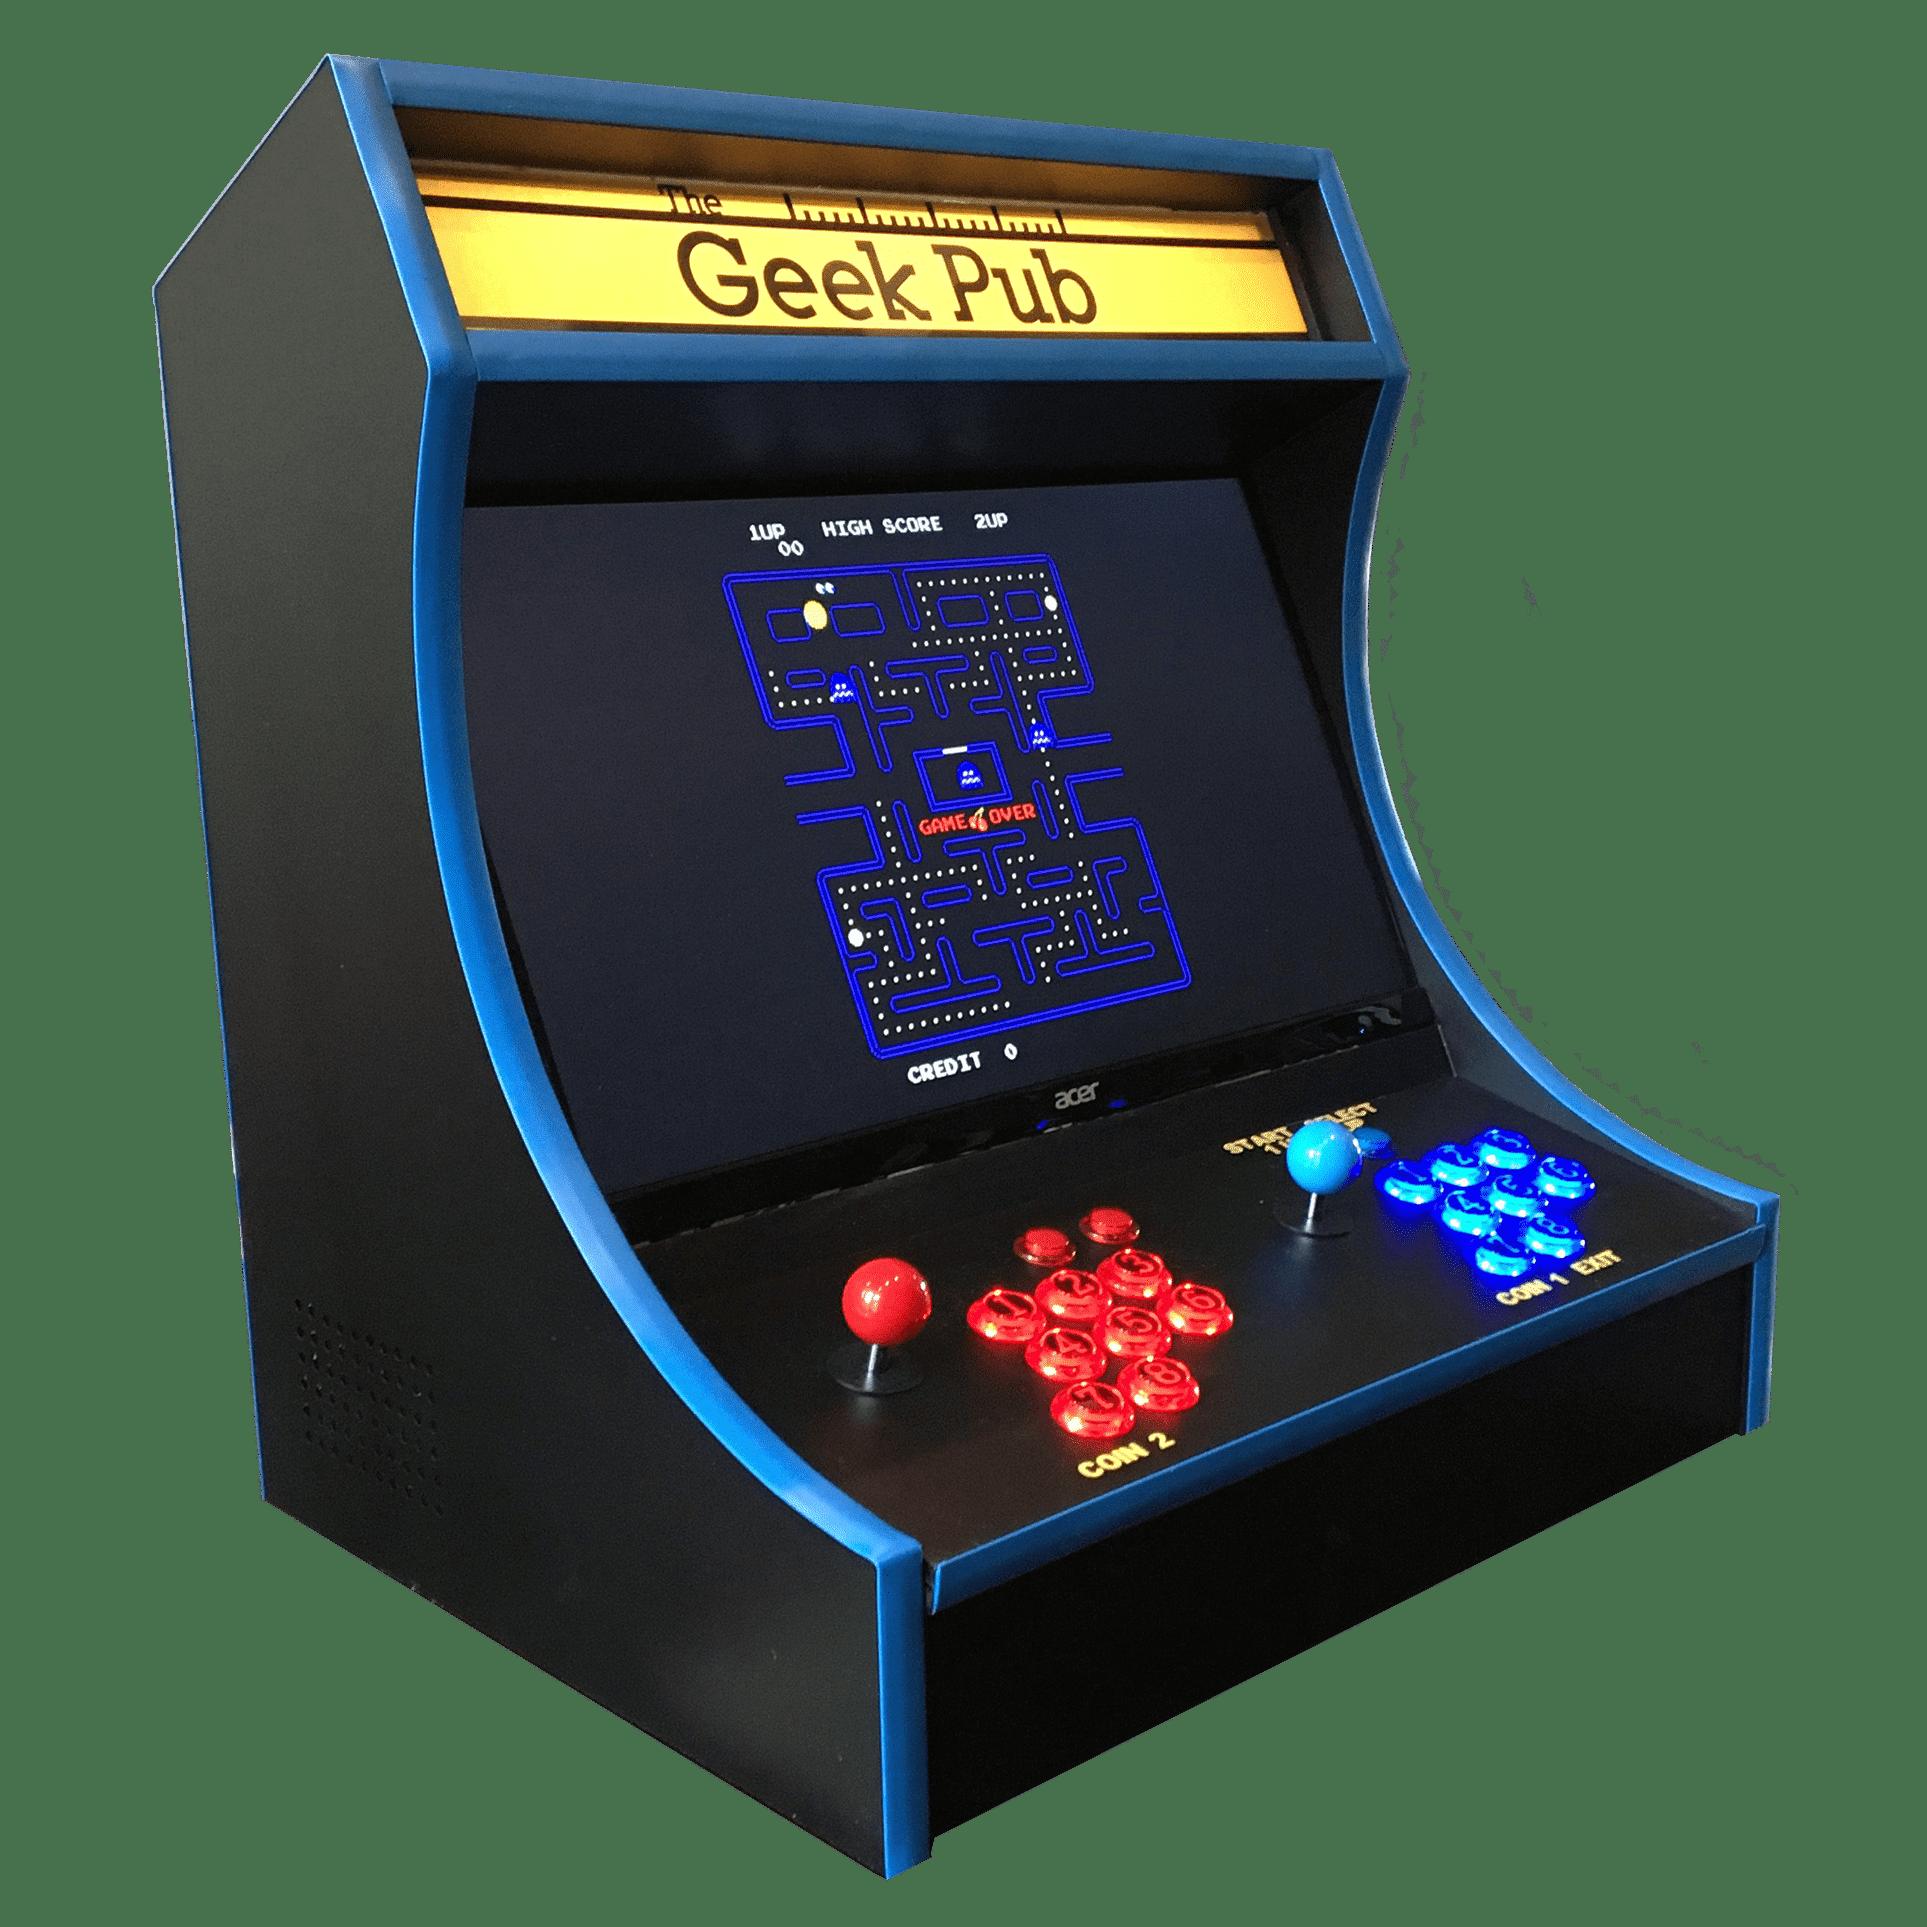 Bartop Arcade Cabinet Plans - The Geek Pub